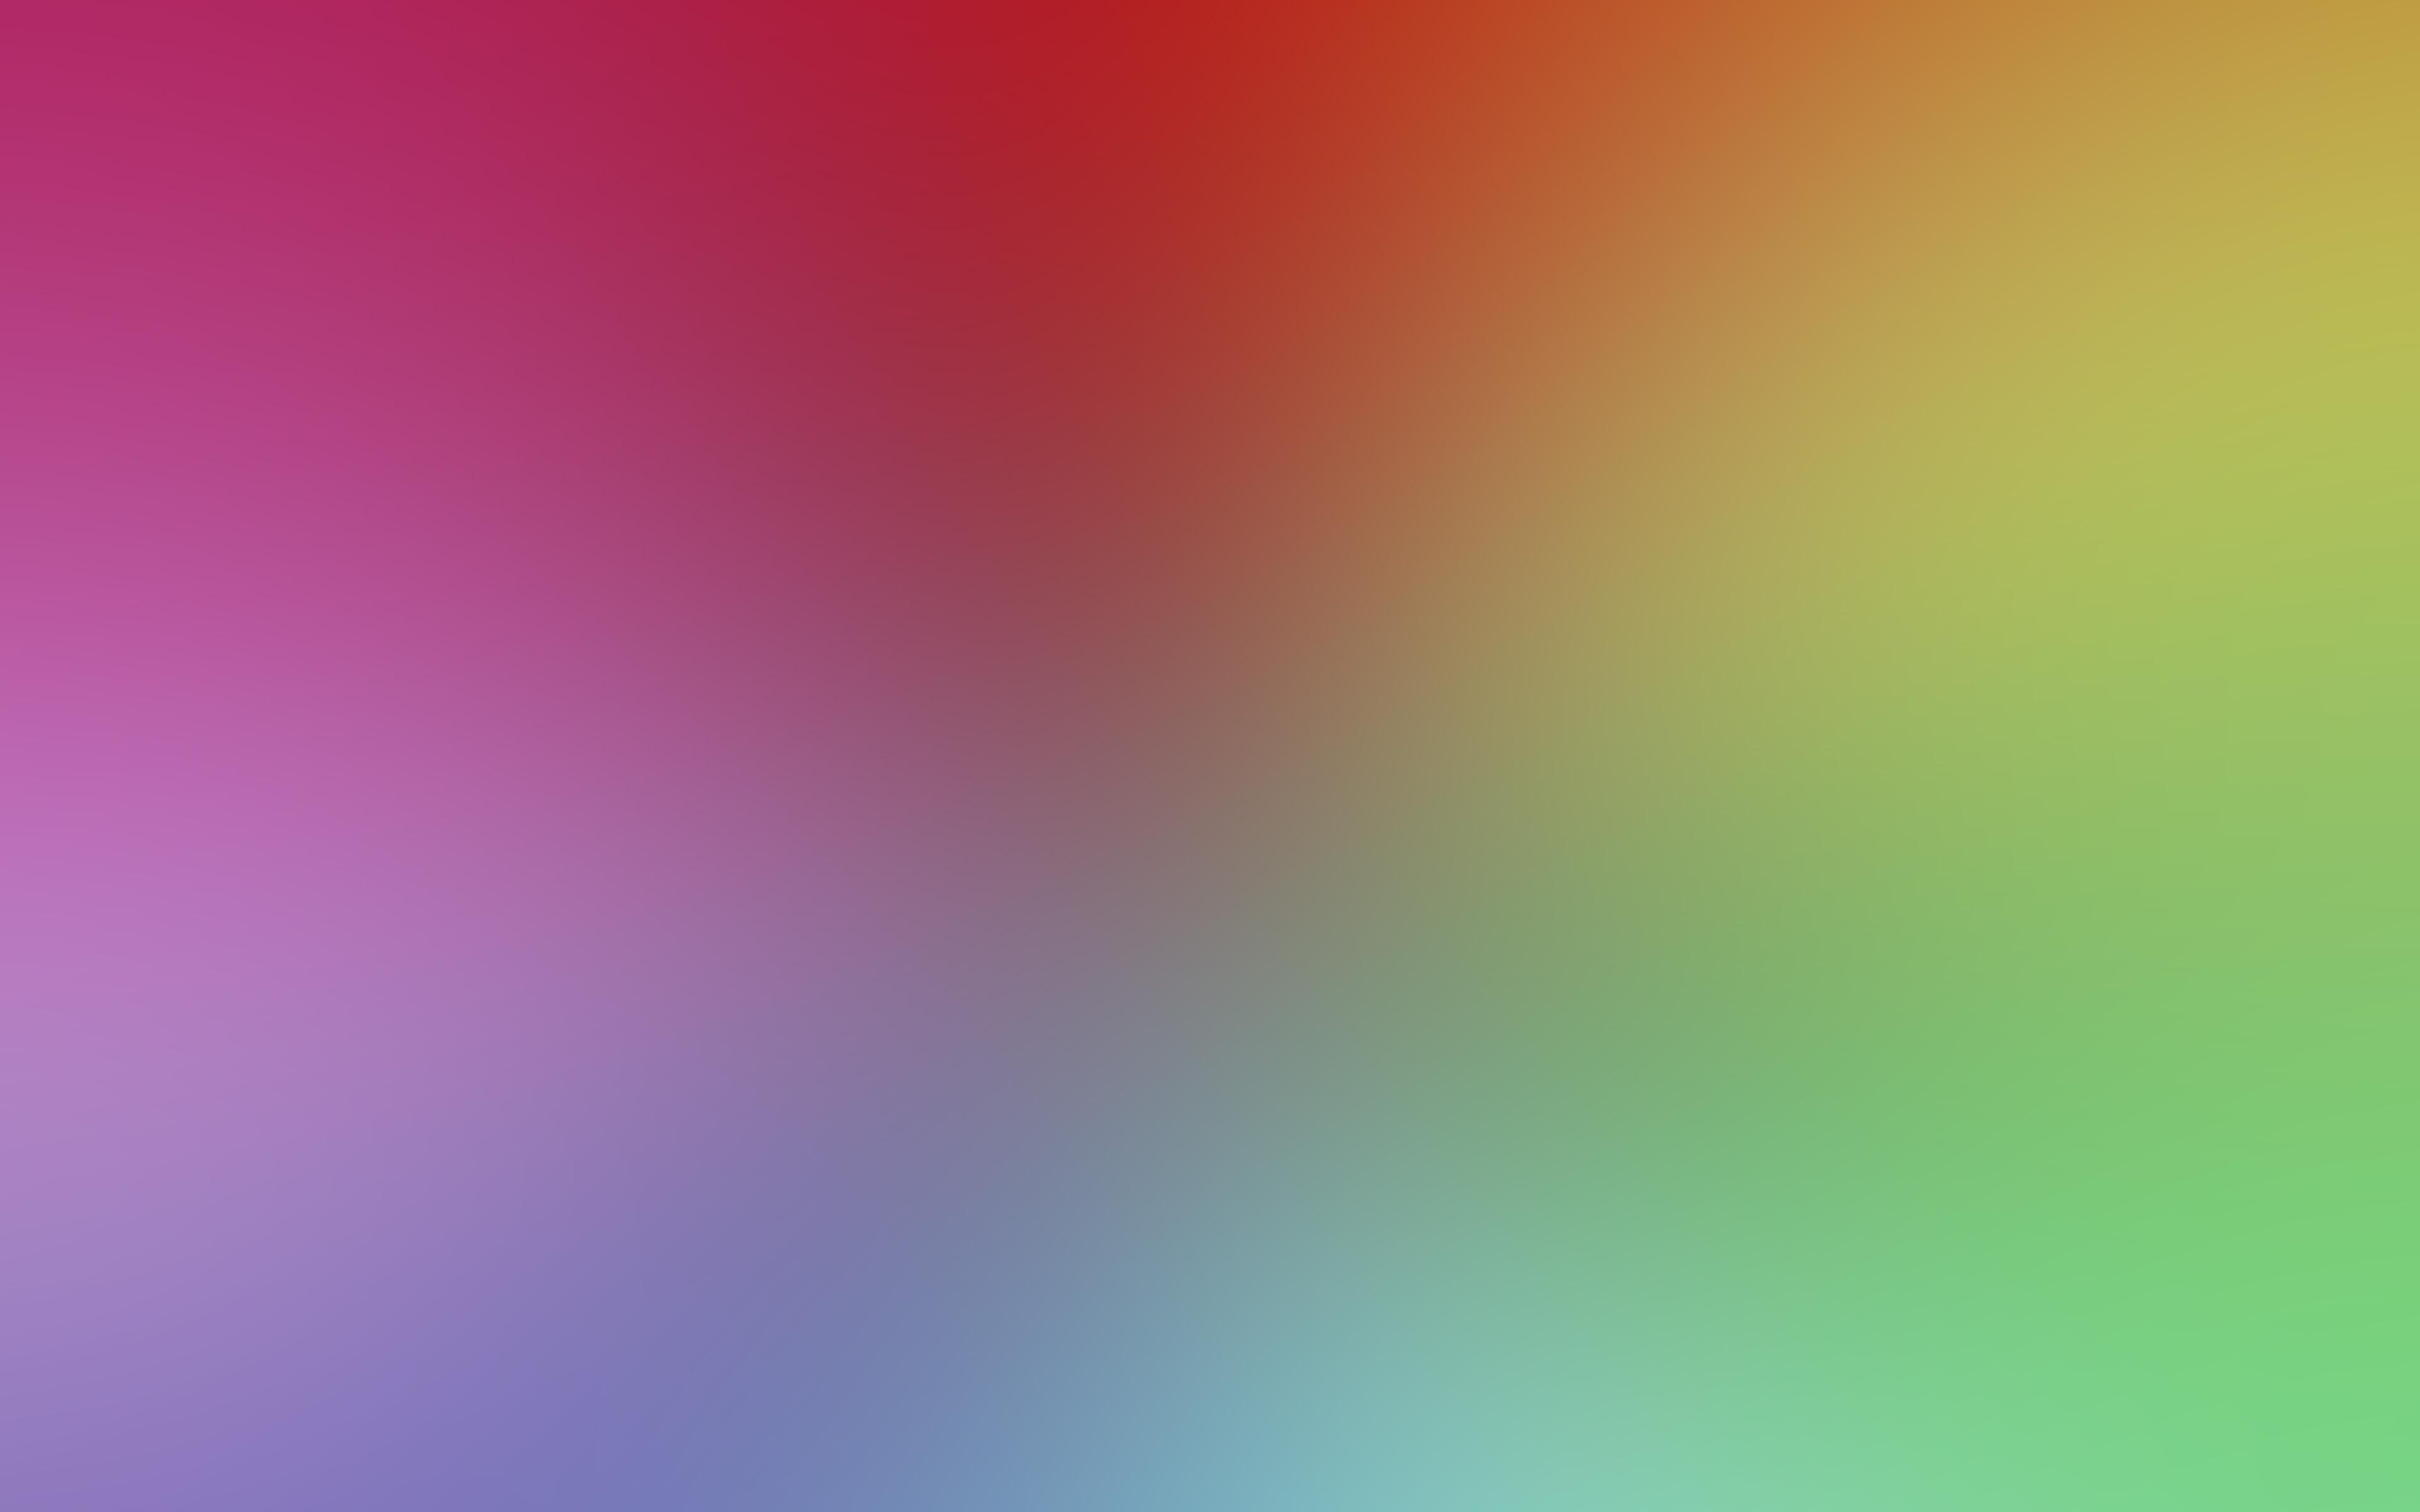 Imac 21 - Color gradation wallpaper ...